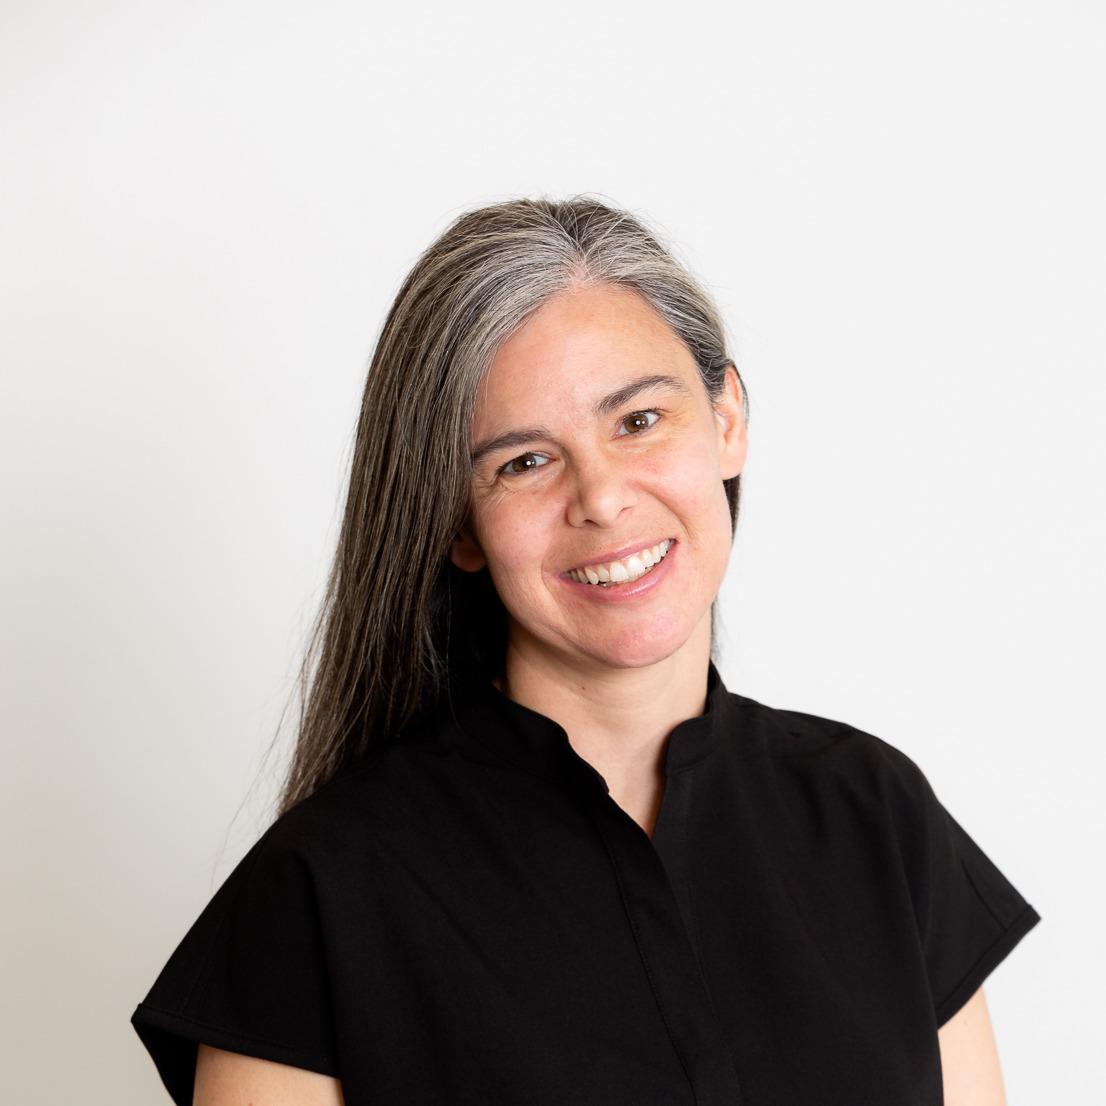 Dr. Sarah E Bouchard